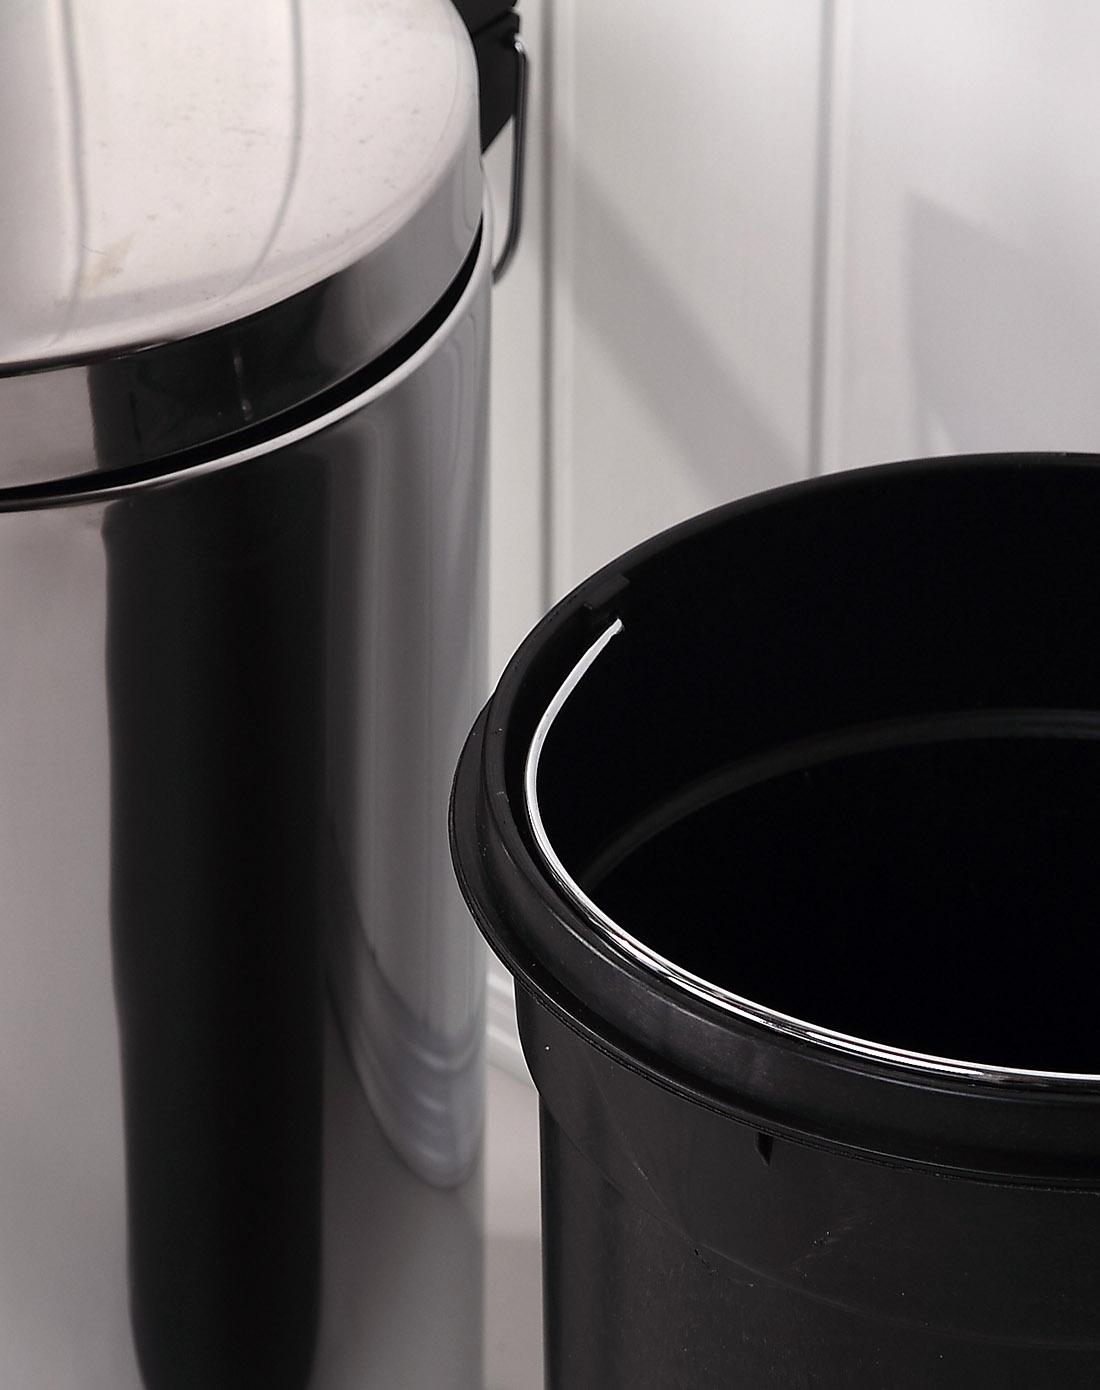 5l不锈钢镜光圆形垃圾桶